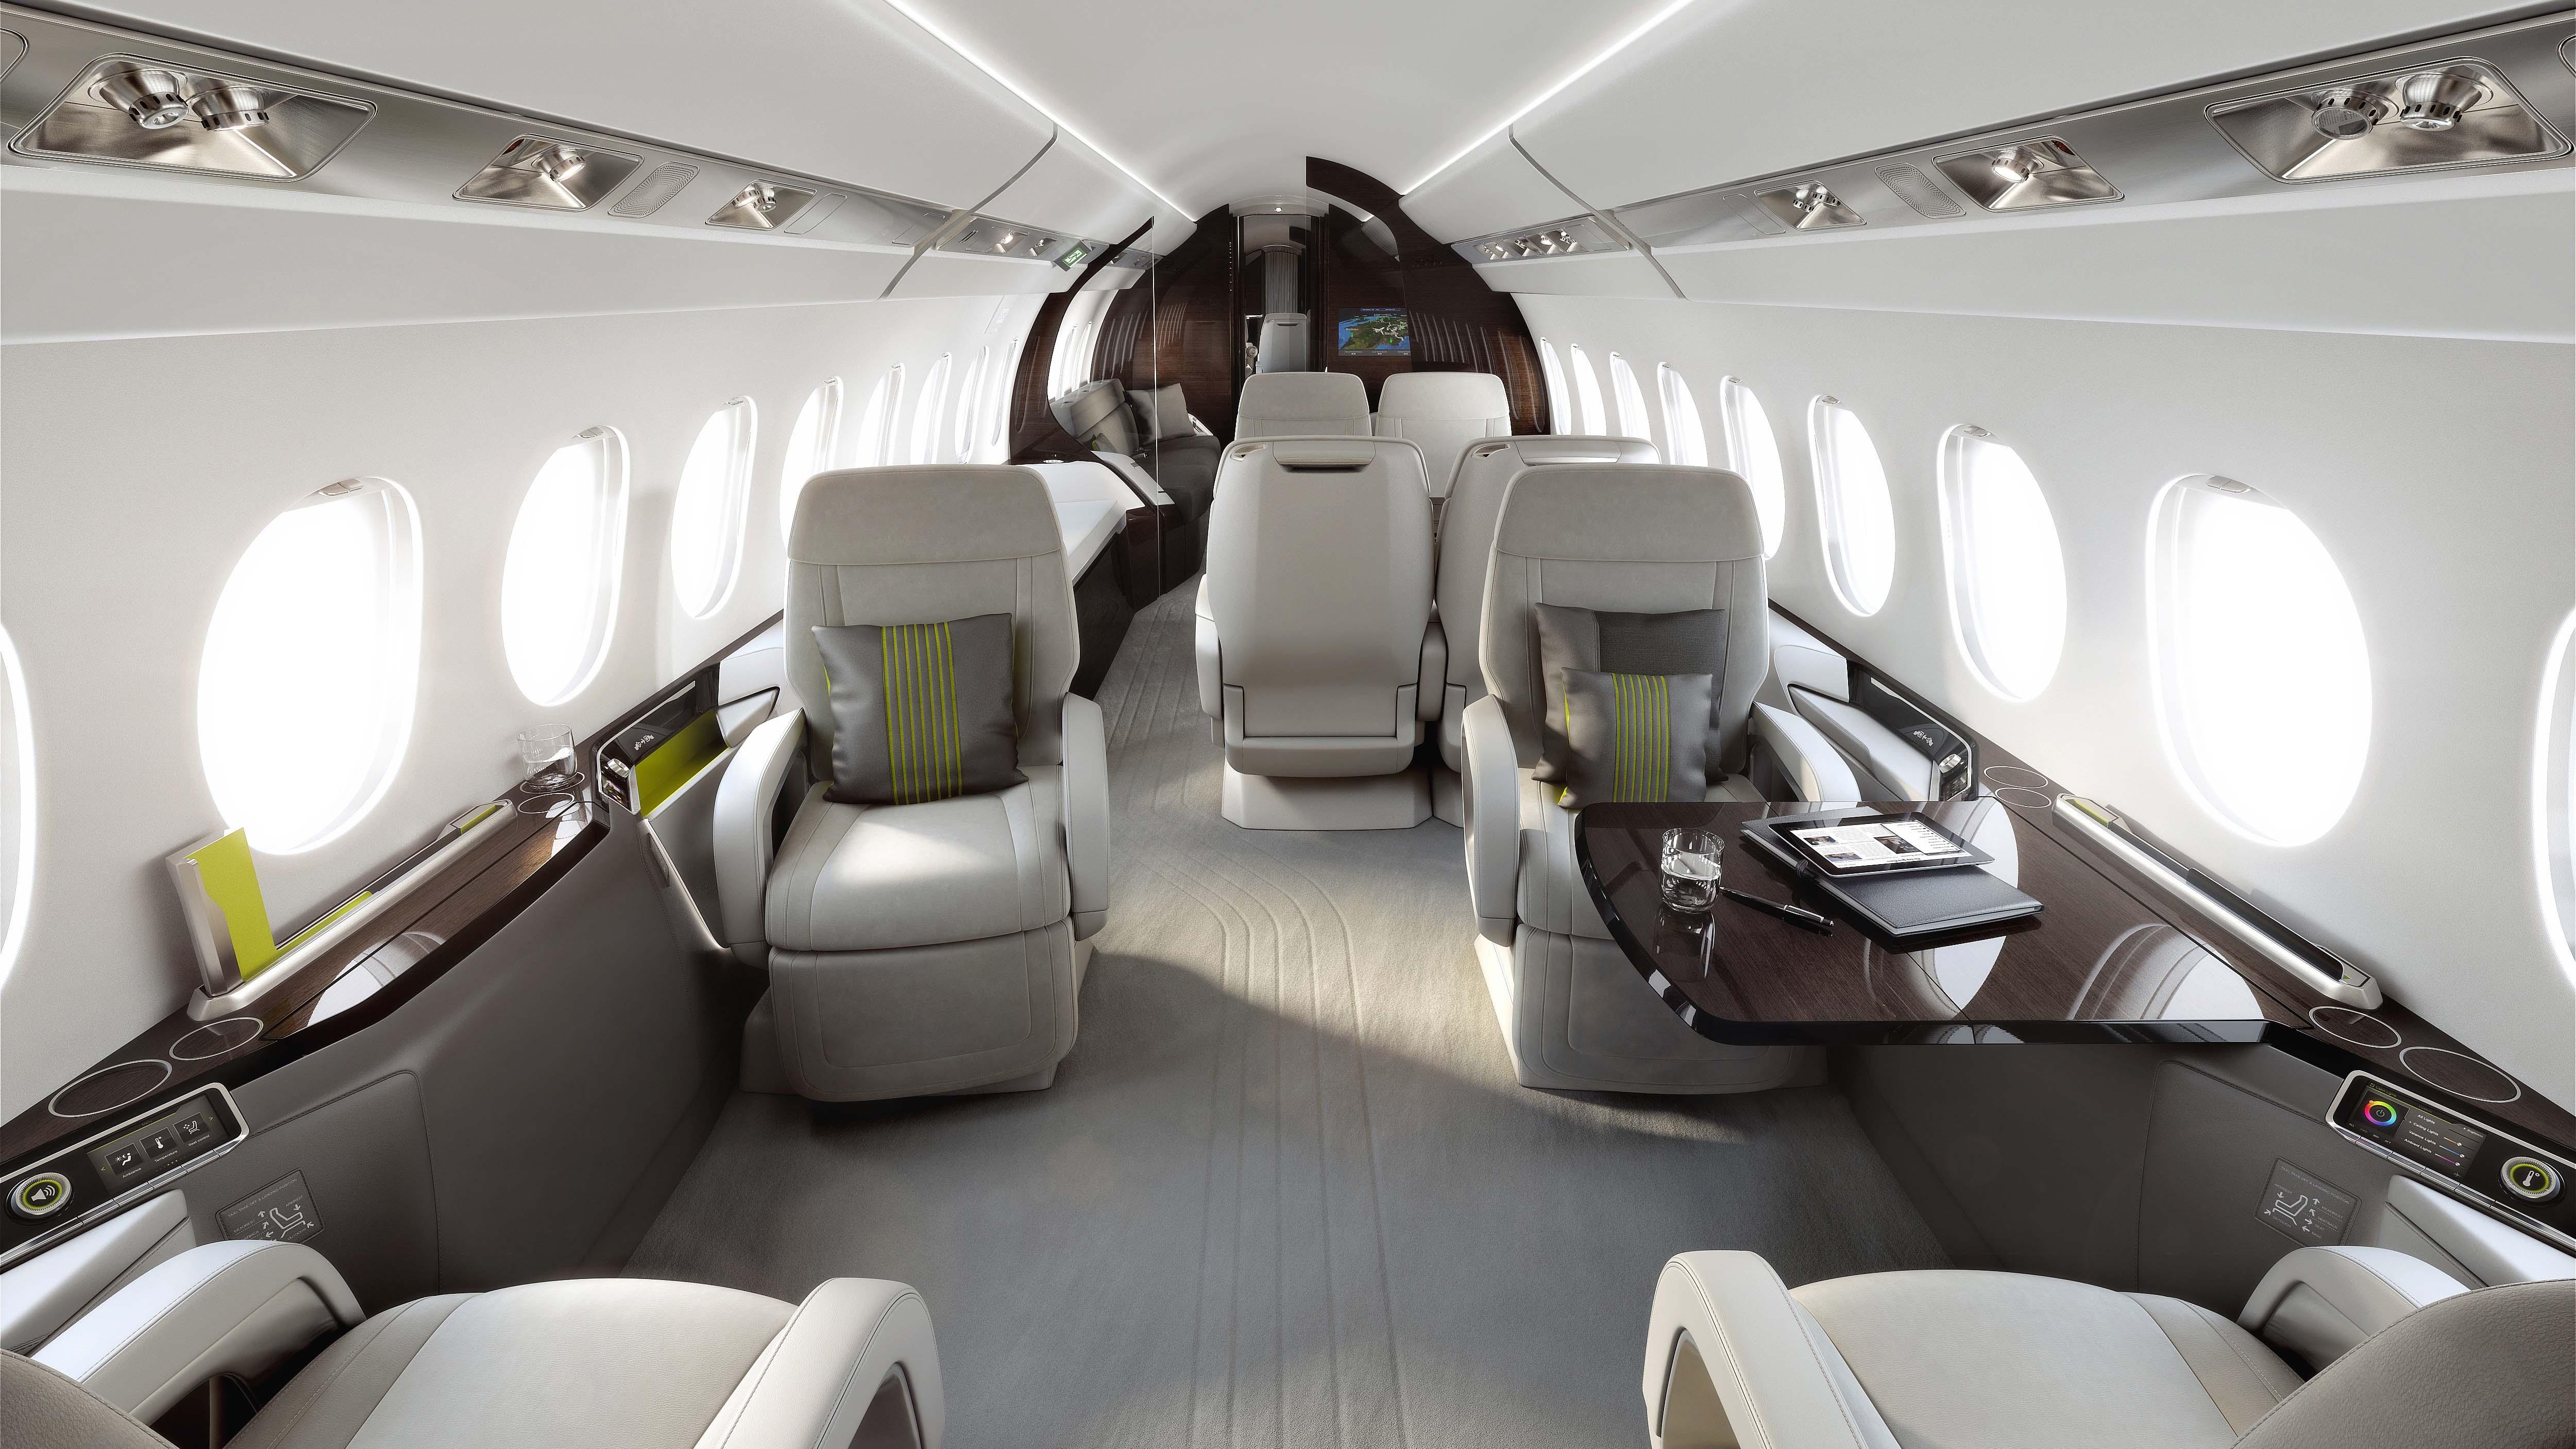 Dassault Falcon 5x private aviation best jet